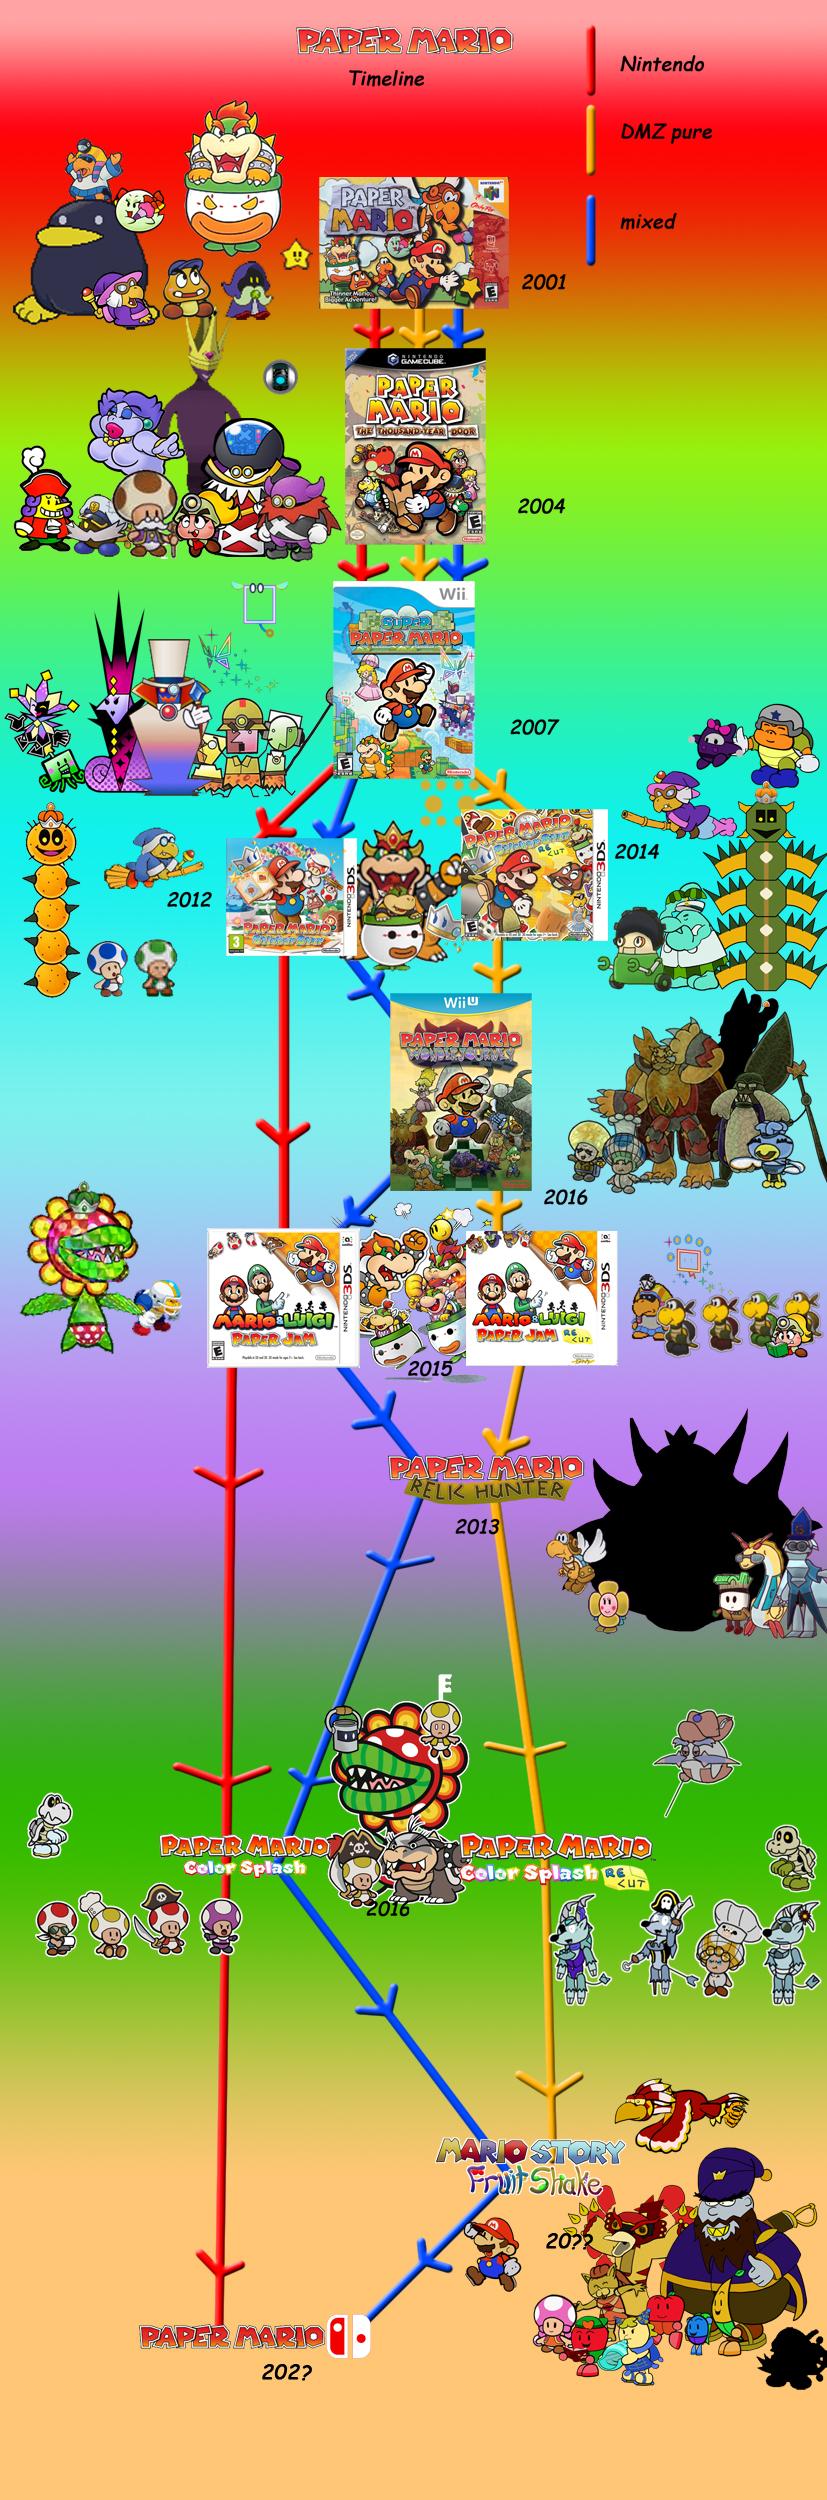 Nintendo and DMZ Paper Mario timeline PLUS TEASER  by DerekminyA